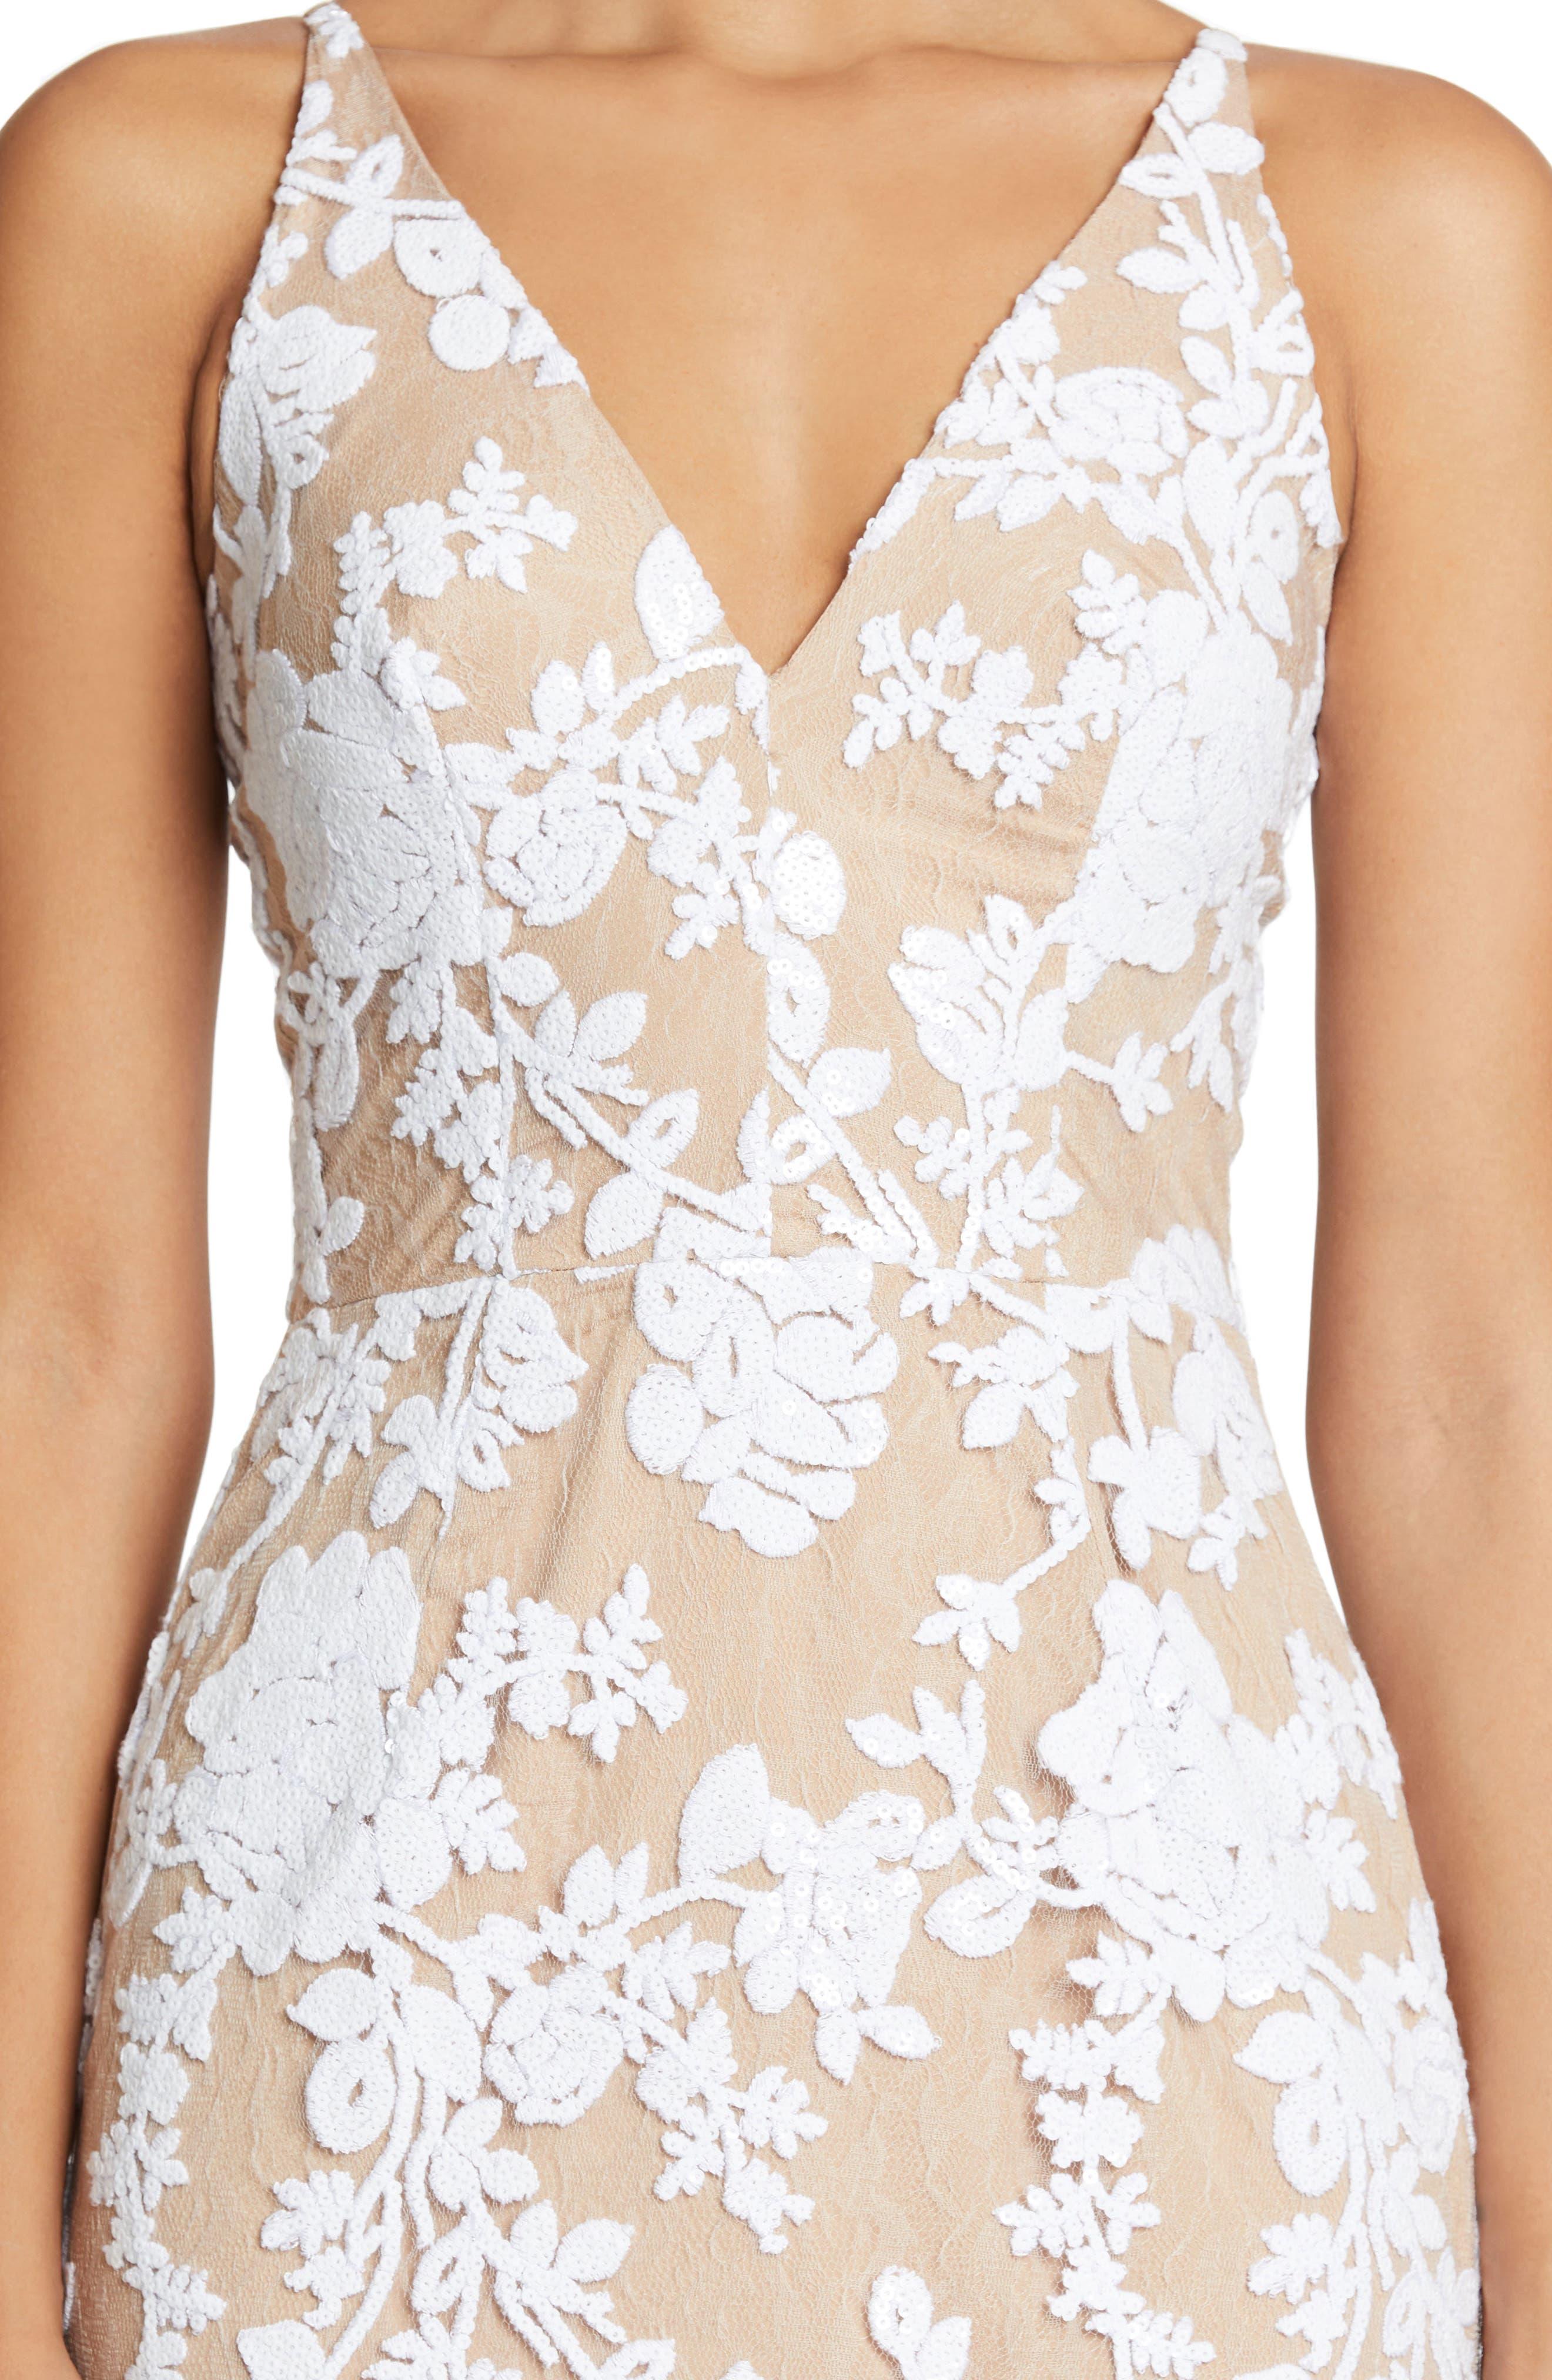 Rebecca Floral Lace Midi Dress,                             Alternate thumbnail 8, color,